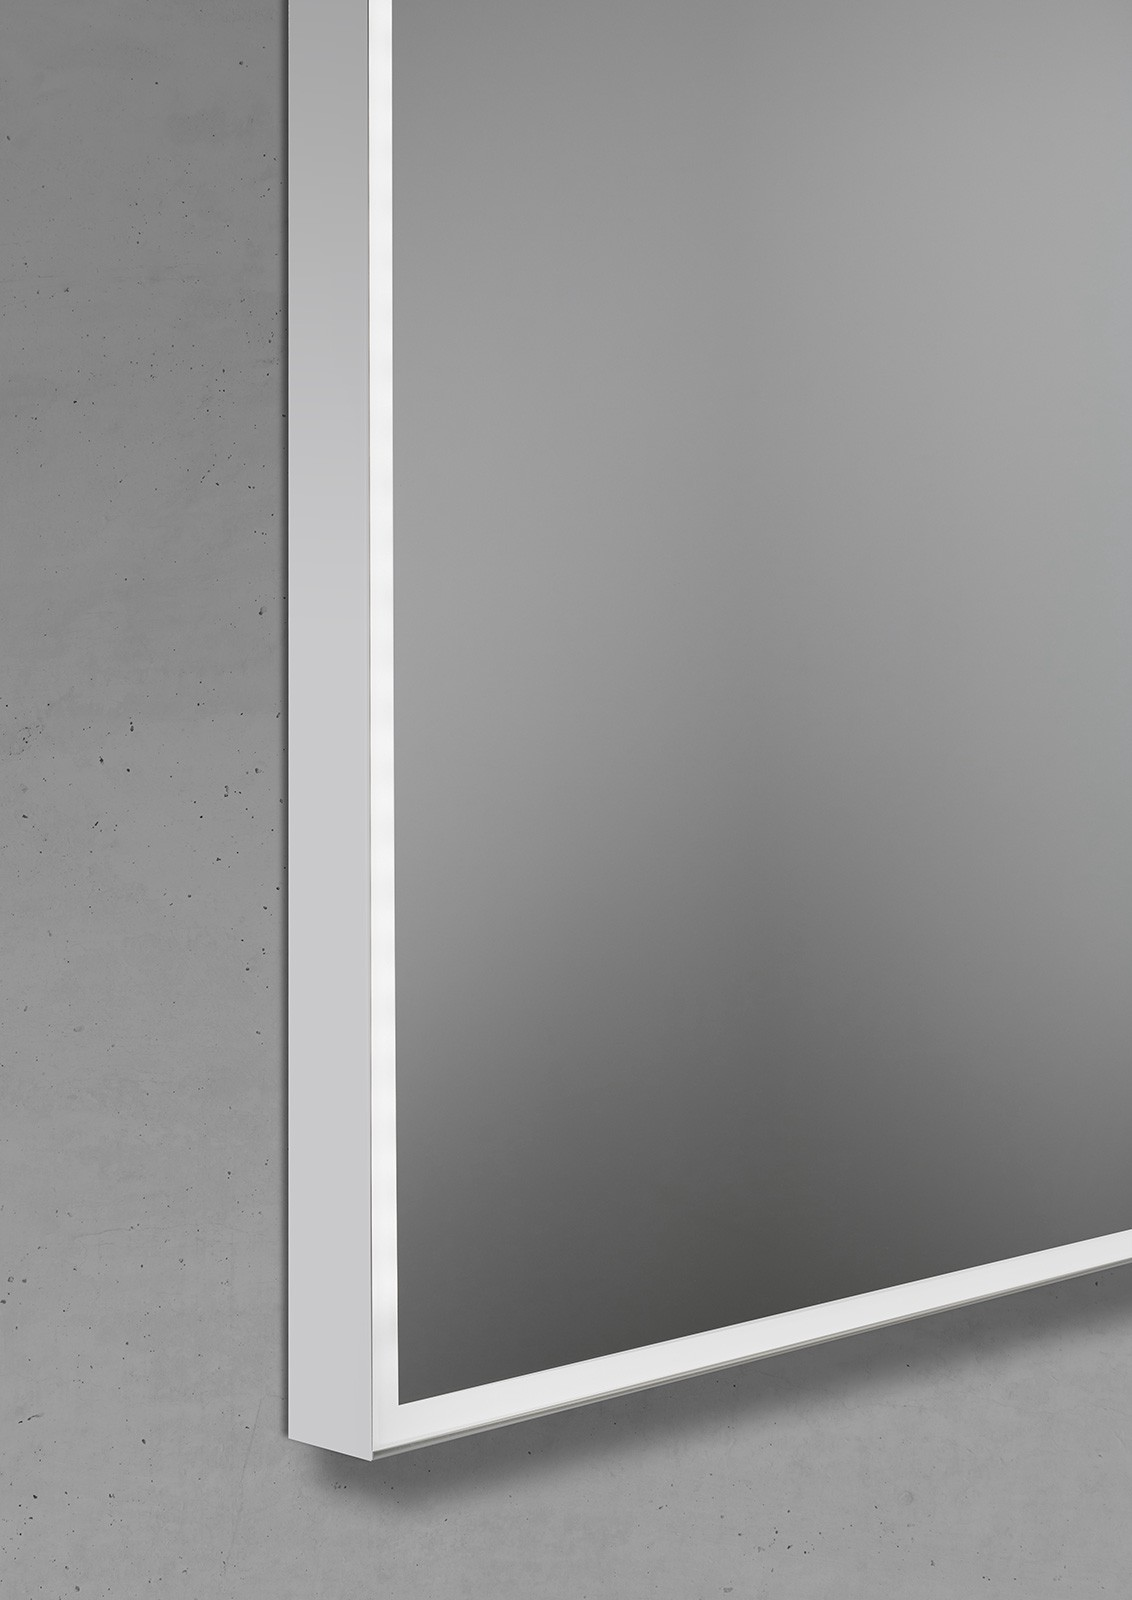 badspiegel mit led beleuchtung 90x70cm lichtspiegel. Black Bedroom Furniture Sets. Home Design Ideas